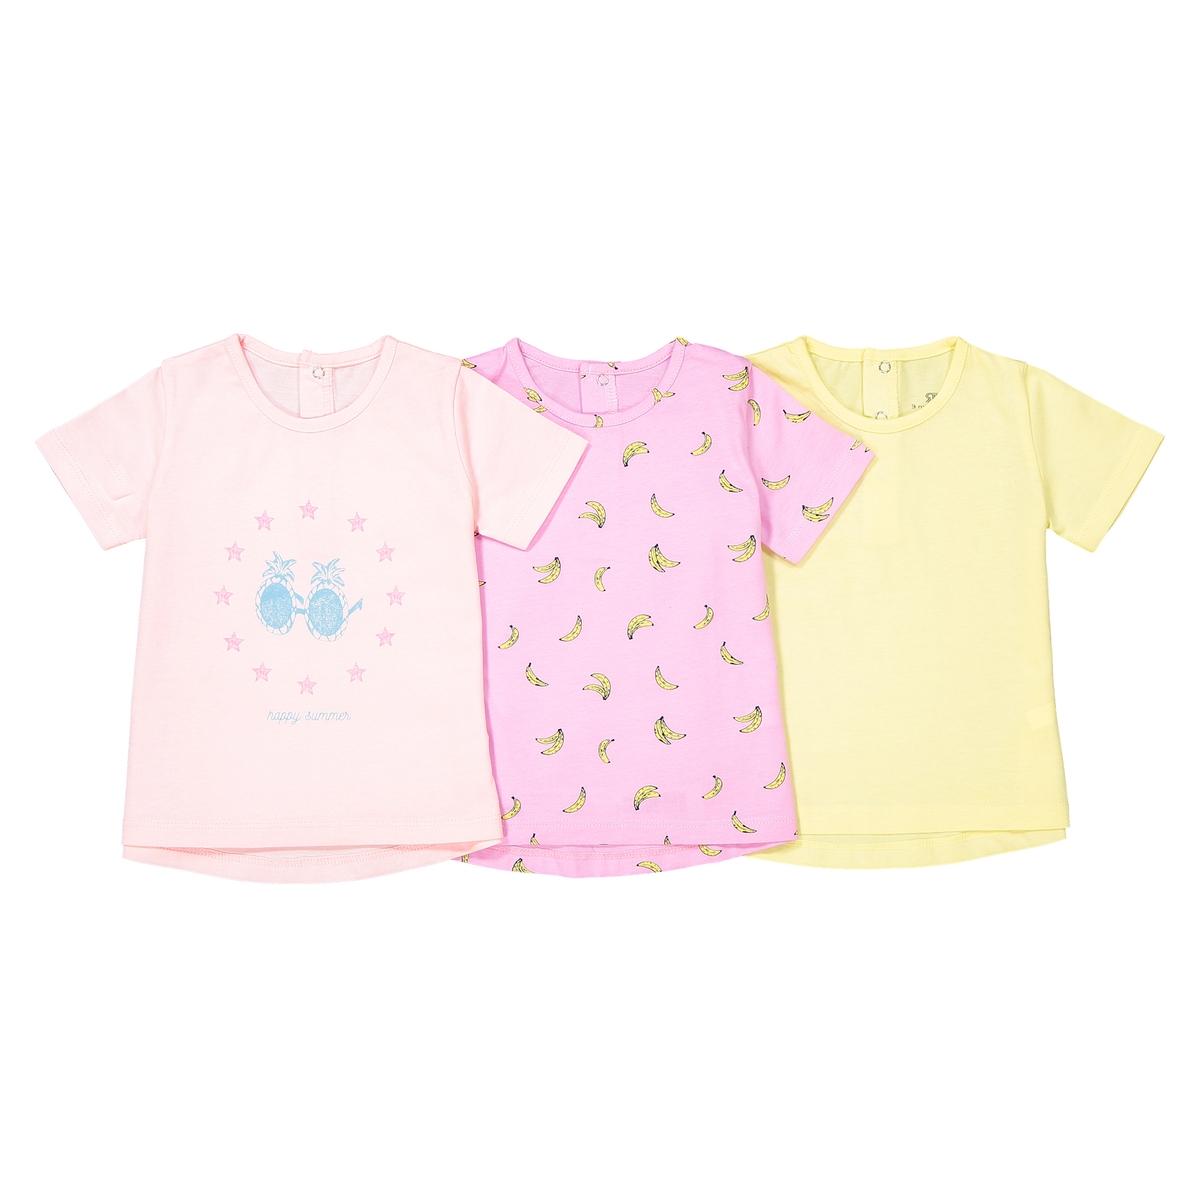 3 футболки с короткими рукавами, 1 мес. - 3 лет